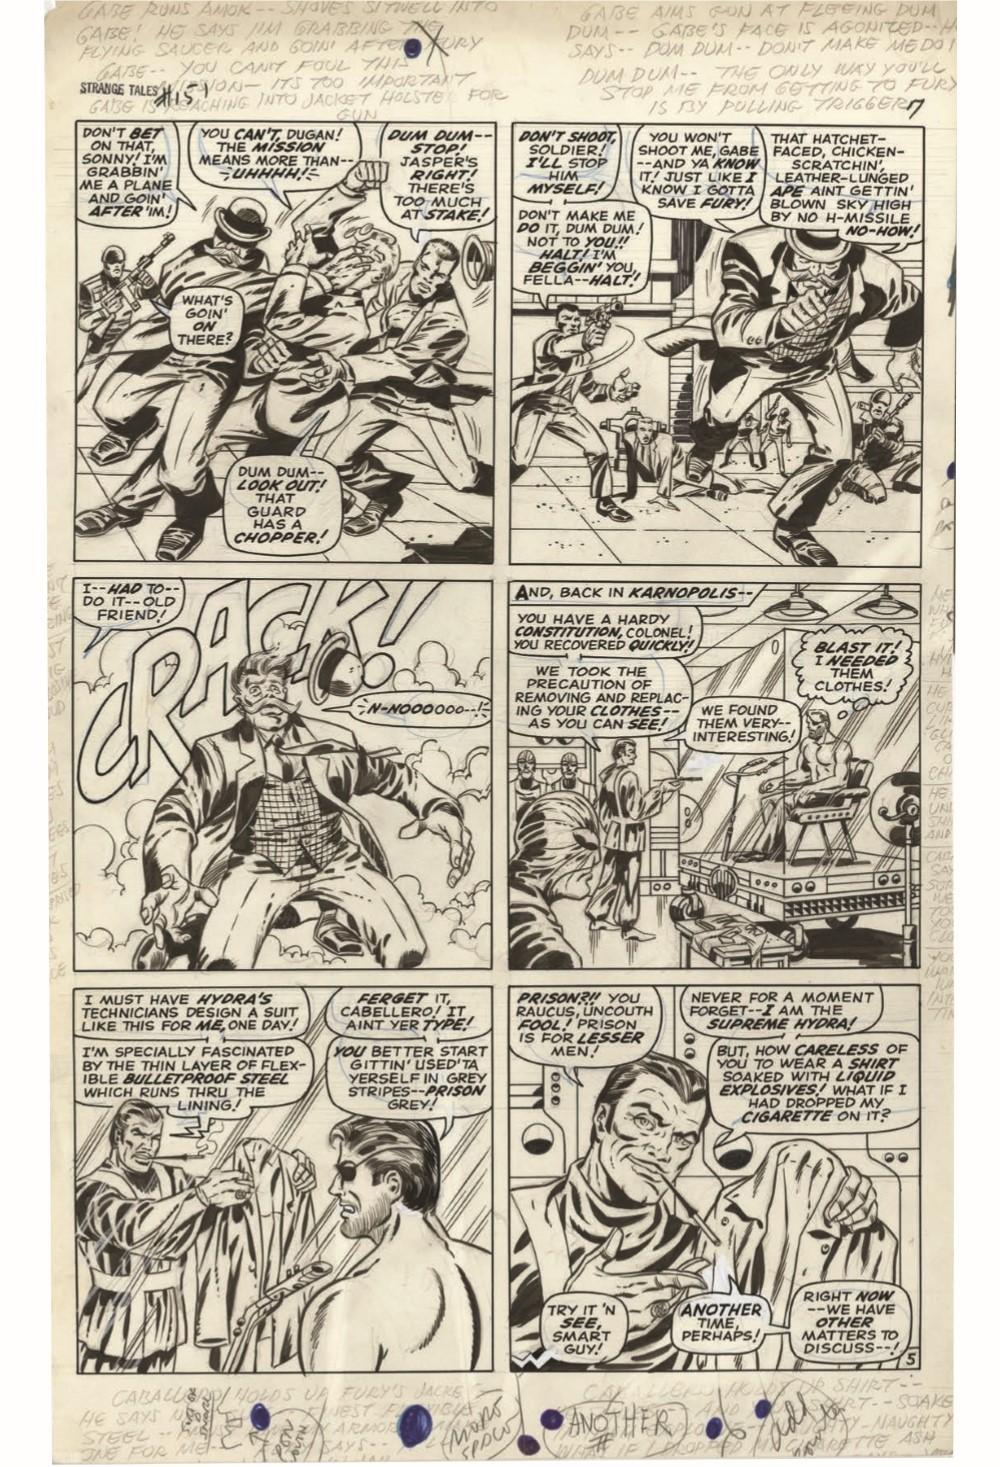 STERANKO_artisan_edition_pr-8 ComicList Previews: JIM STERANKO'S NICK FURY AGENT OF S.H.I.E.L.D. ARTISAN EDITION TP